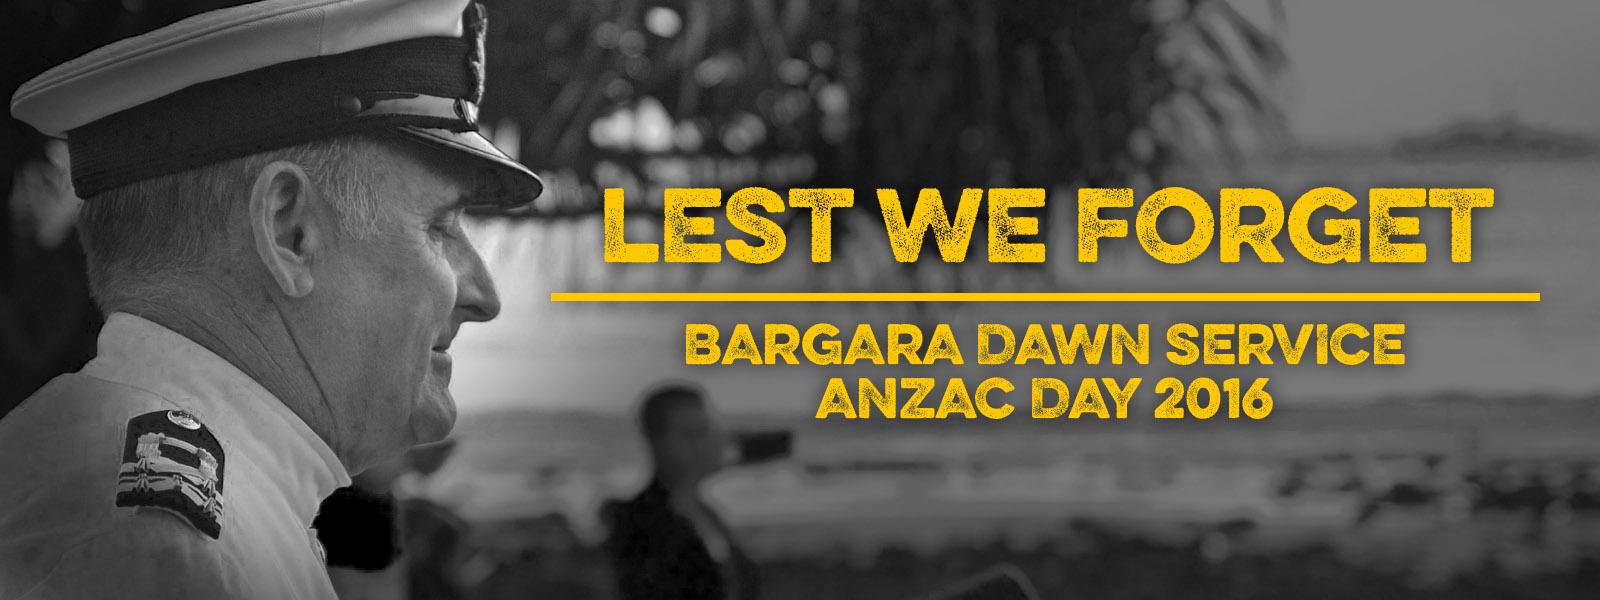 ANZAC Day 2016 – Bargara Dawn Service